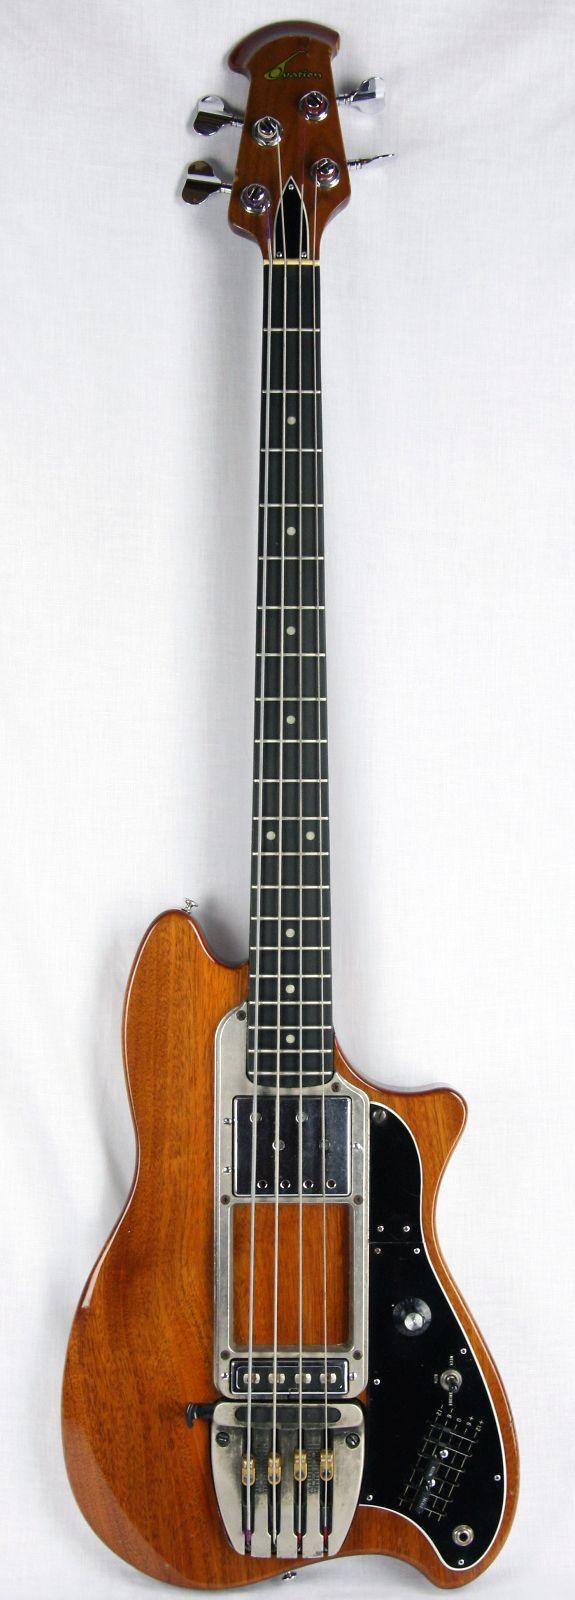 1970's Ovation Magnum II Bass #LardysChordophoneOfTheDay #Bass ~ https://www.pinterest.com/lardyfatboy/lardys-other-fretted-chordophones-of-the-day/ ~